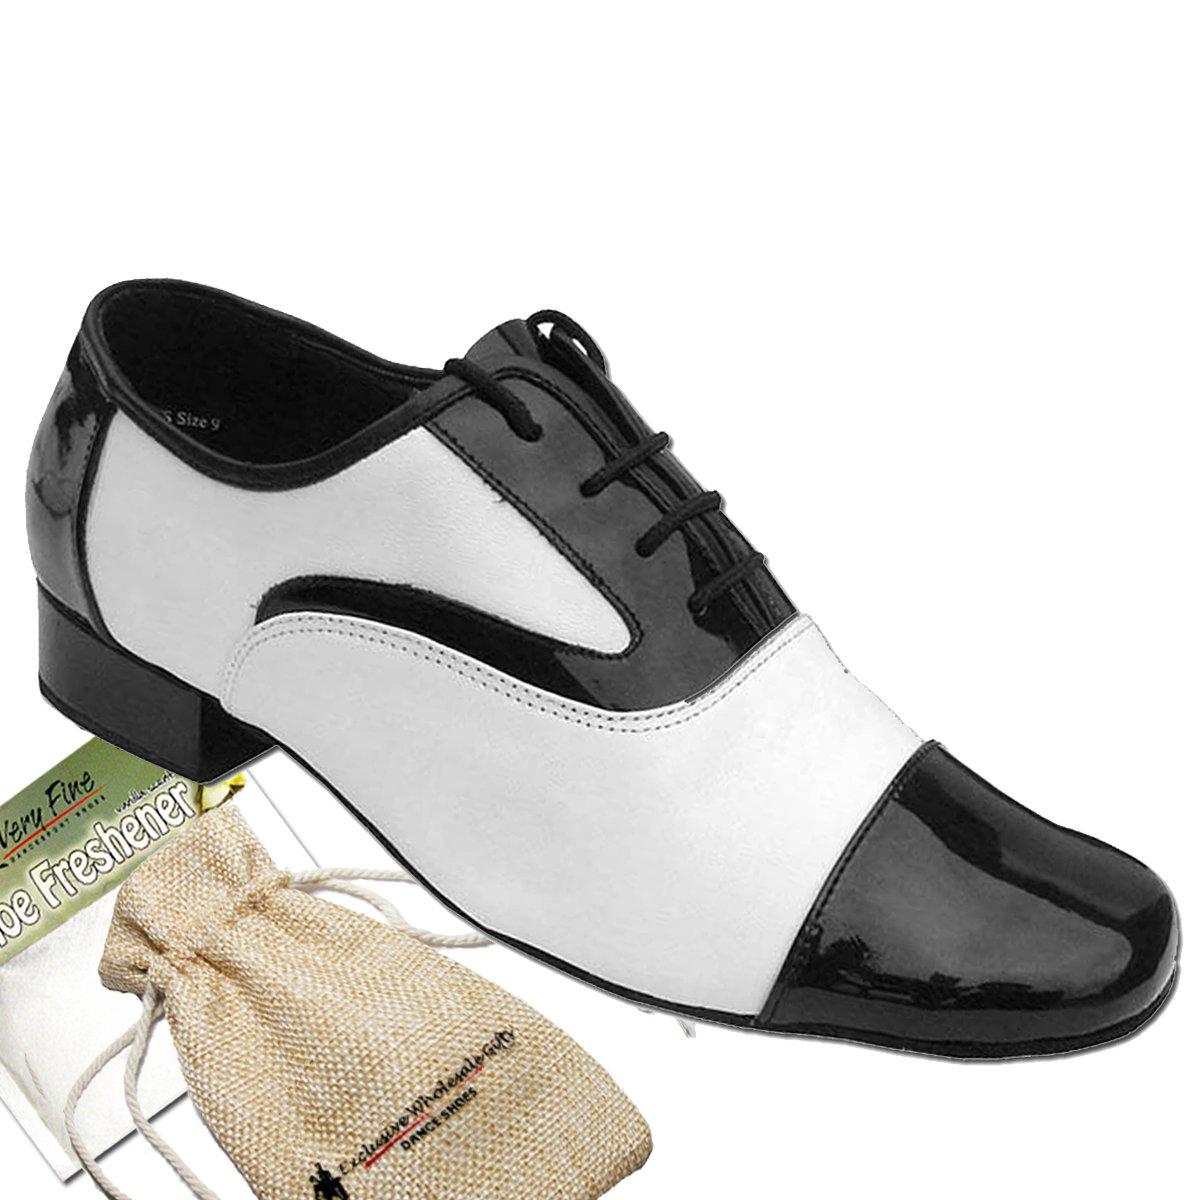 Men's Ballroom Salsa Standard & Smooth Black & White Dance Shoes Comfortable - Very Fine (Bundle of 4) B075H37R7X 8.5 M US: 1